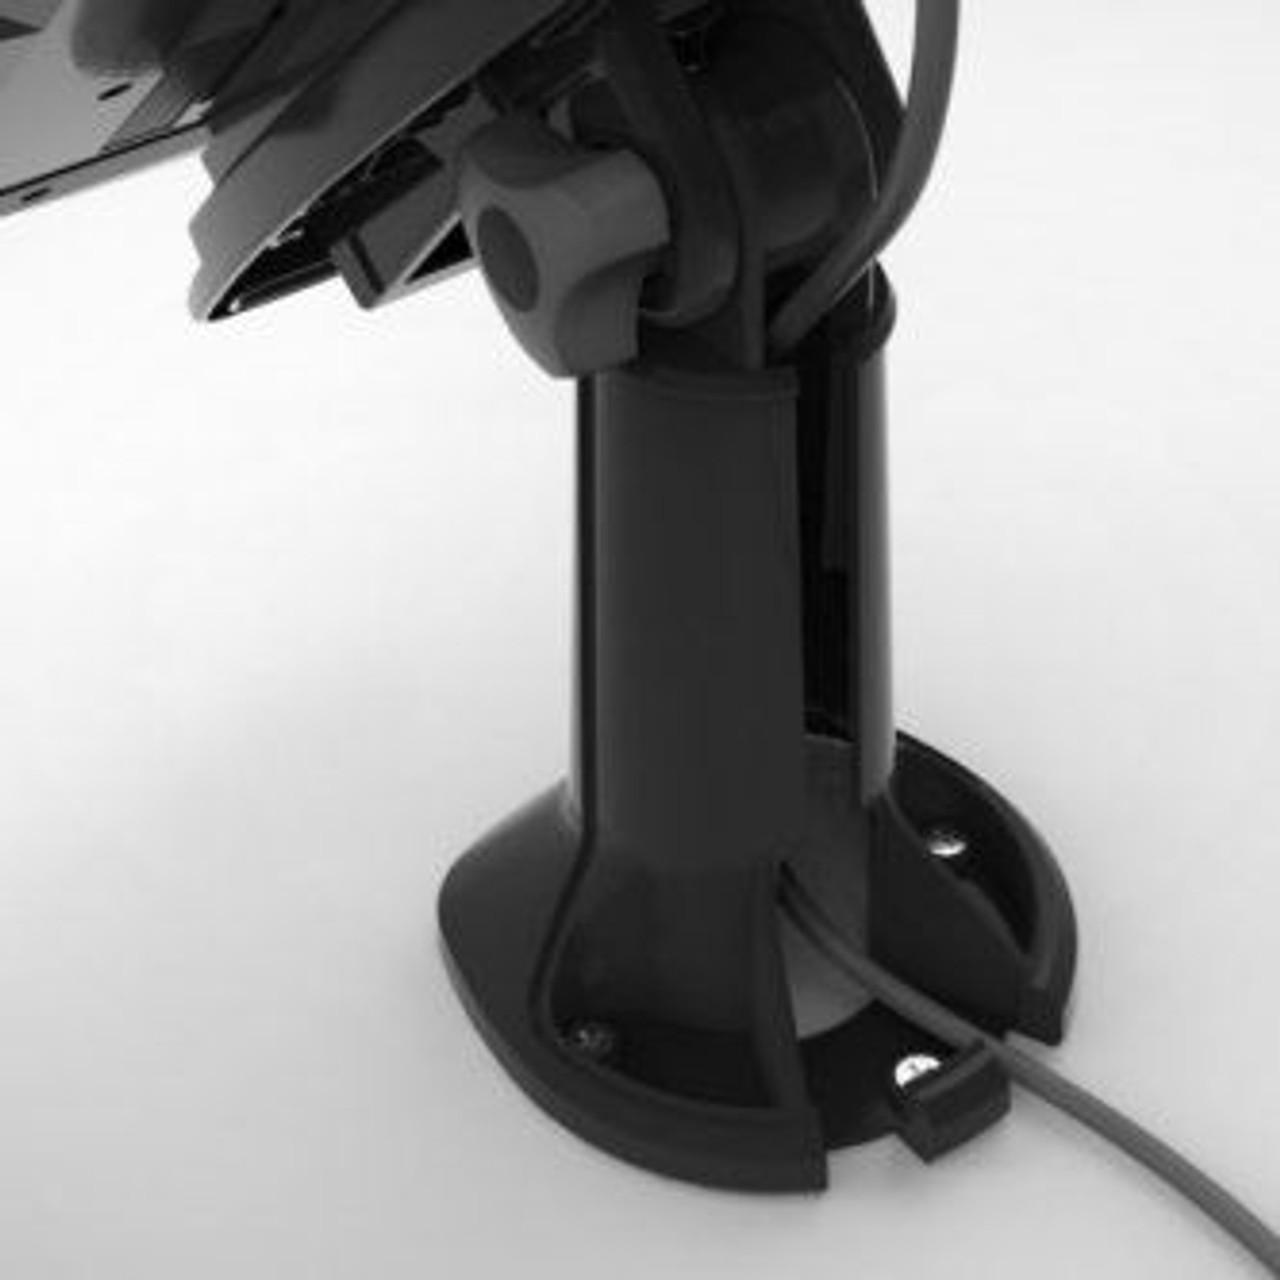 Ingenico iPP310 iPP320 iPP350  Tailwind FlexiPole Plus Stand